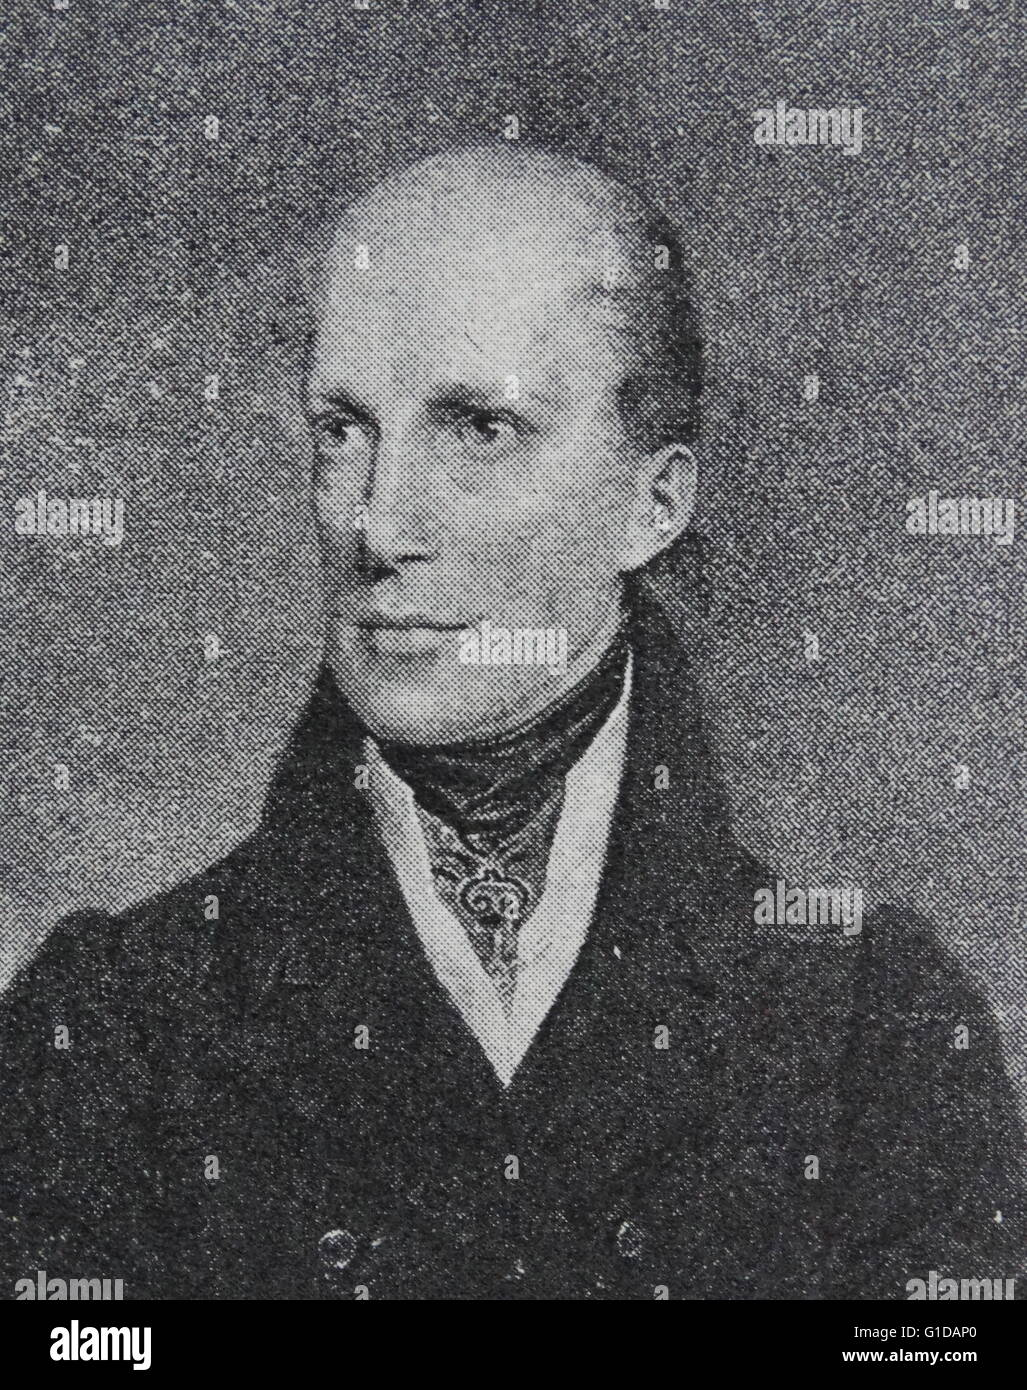 Archduke John of Austria (1782 – 1859), member of the House of Habsburg-Lorraine, was an Austrian field marshal - Stock Image